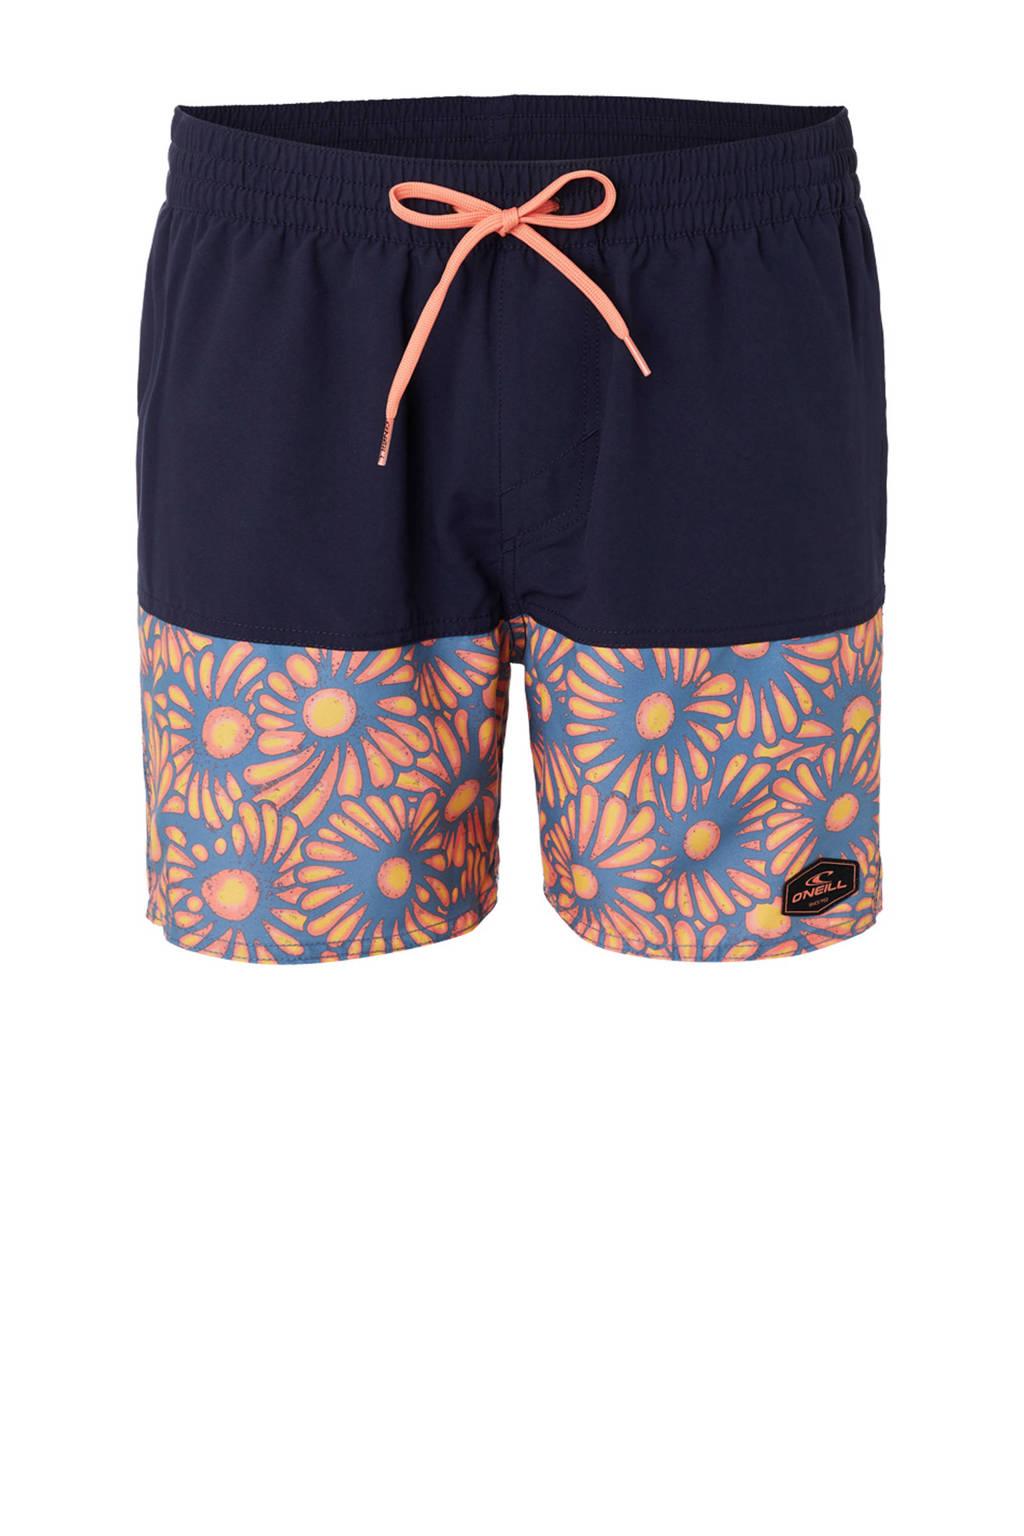 O'Neill zwemshort Spliced donkerblauw, Donkerblauw